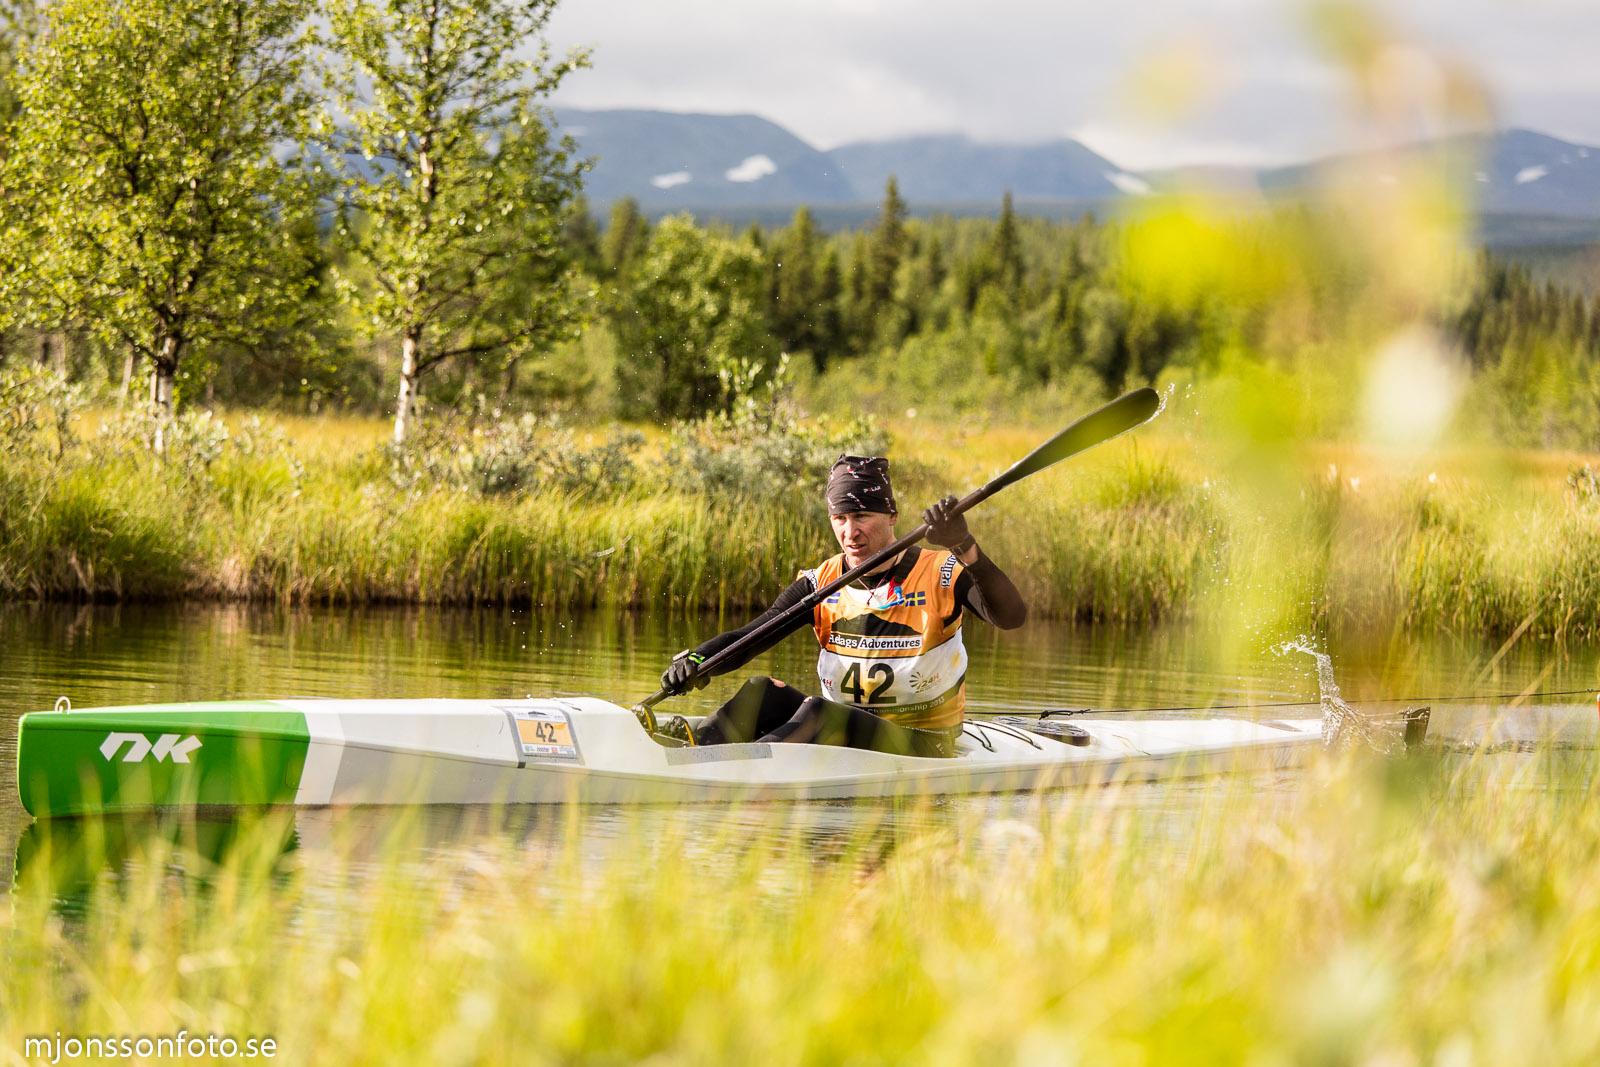 24h-adventure-2013-paddling-00023